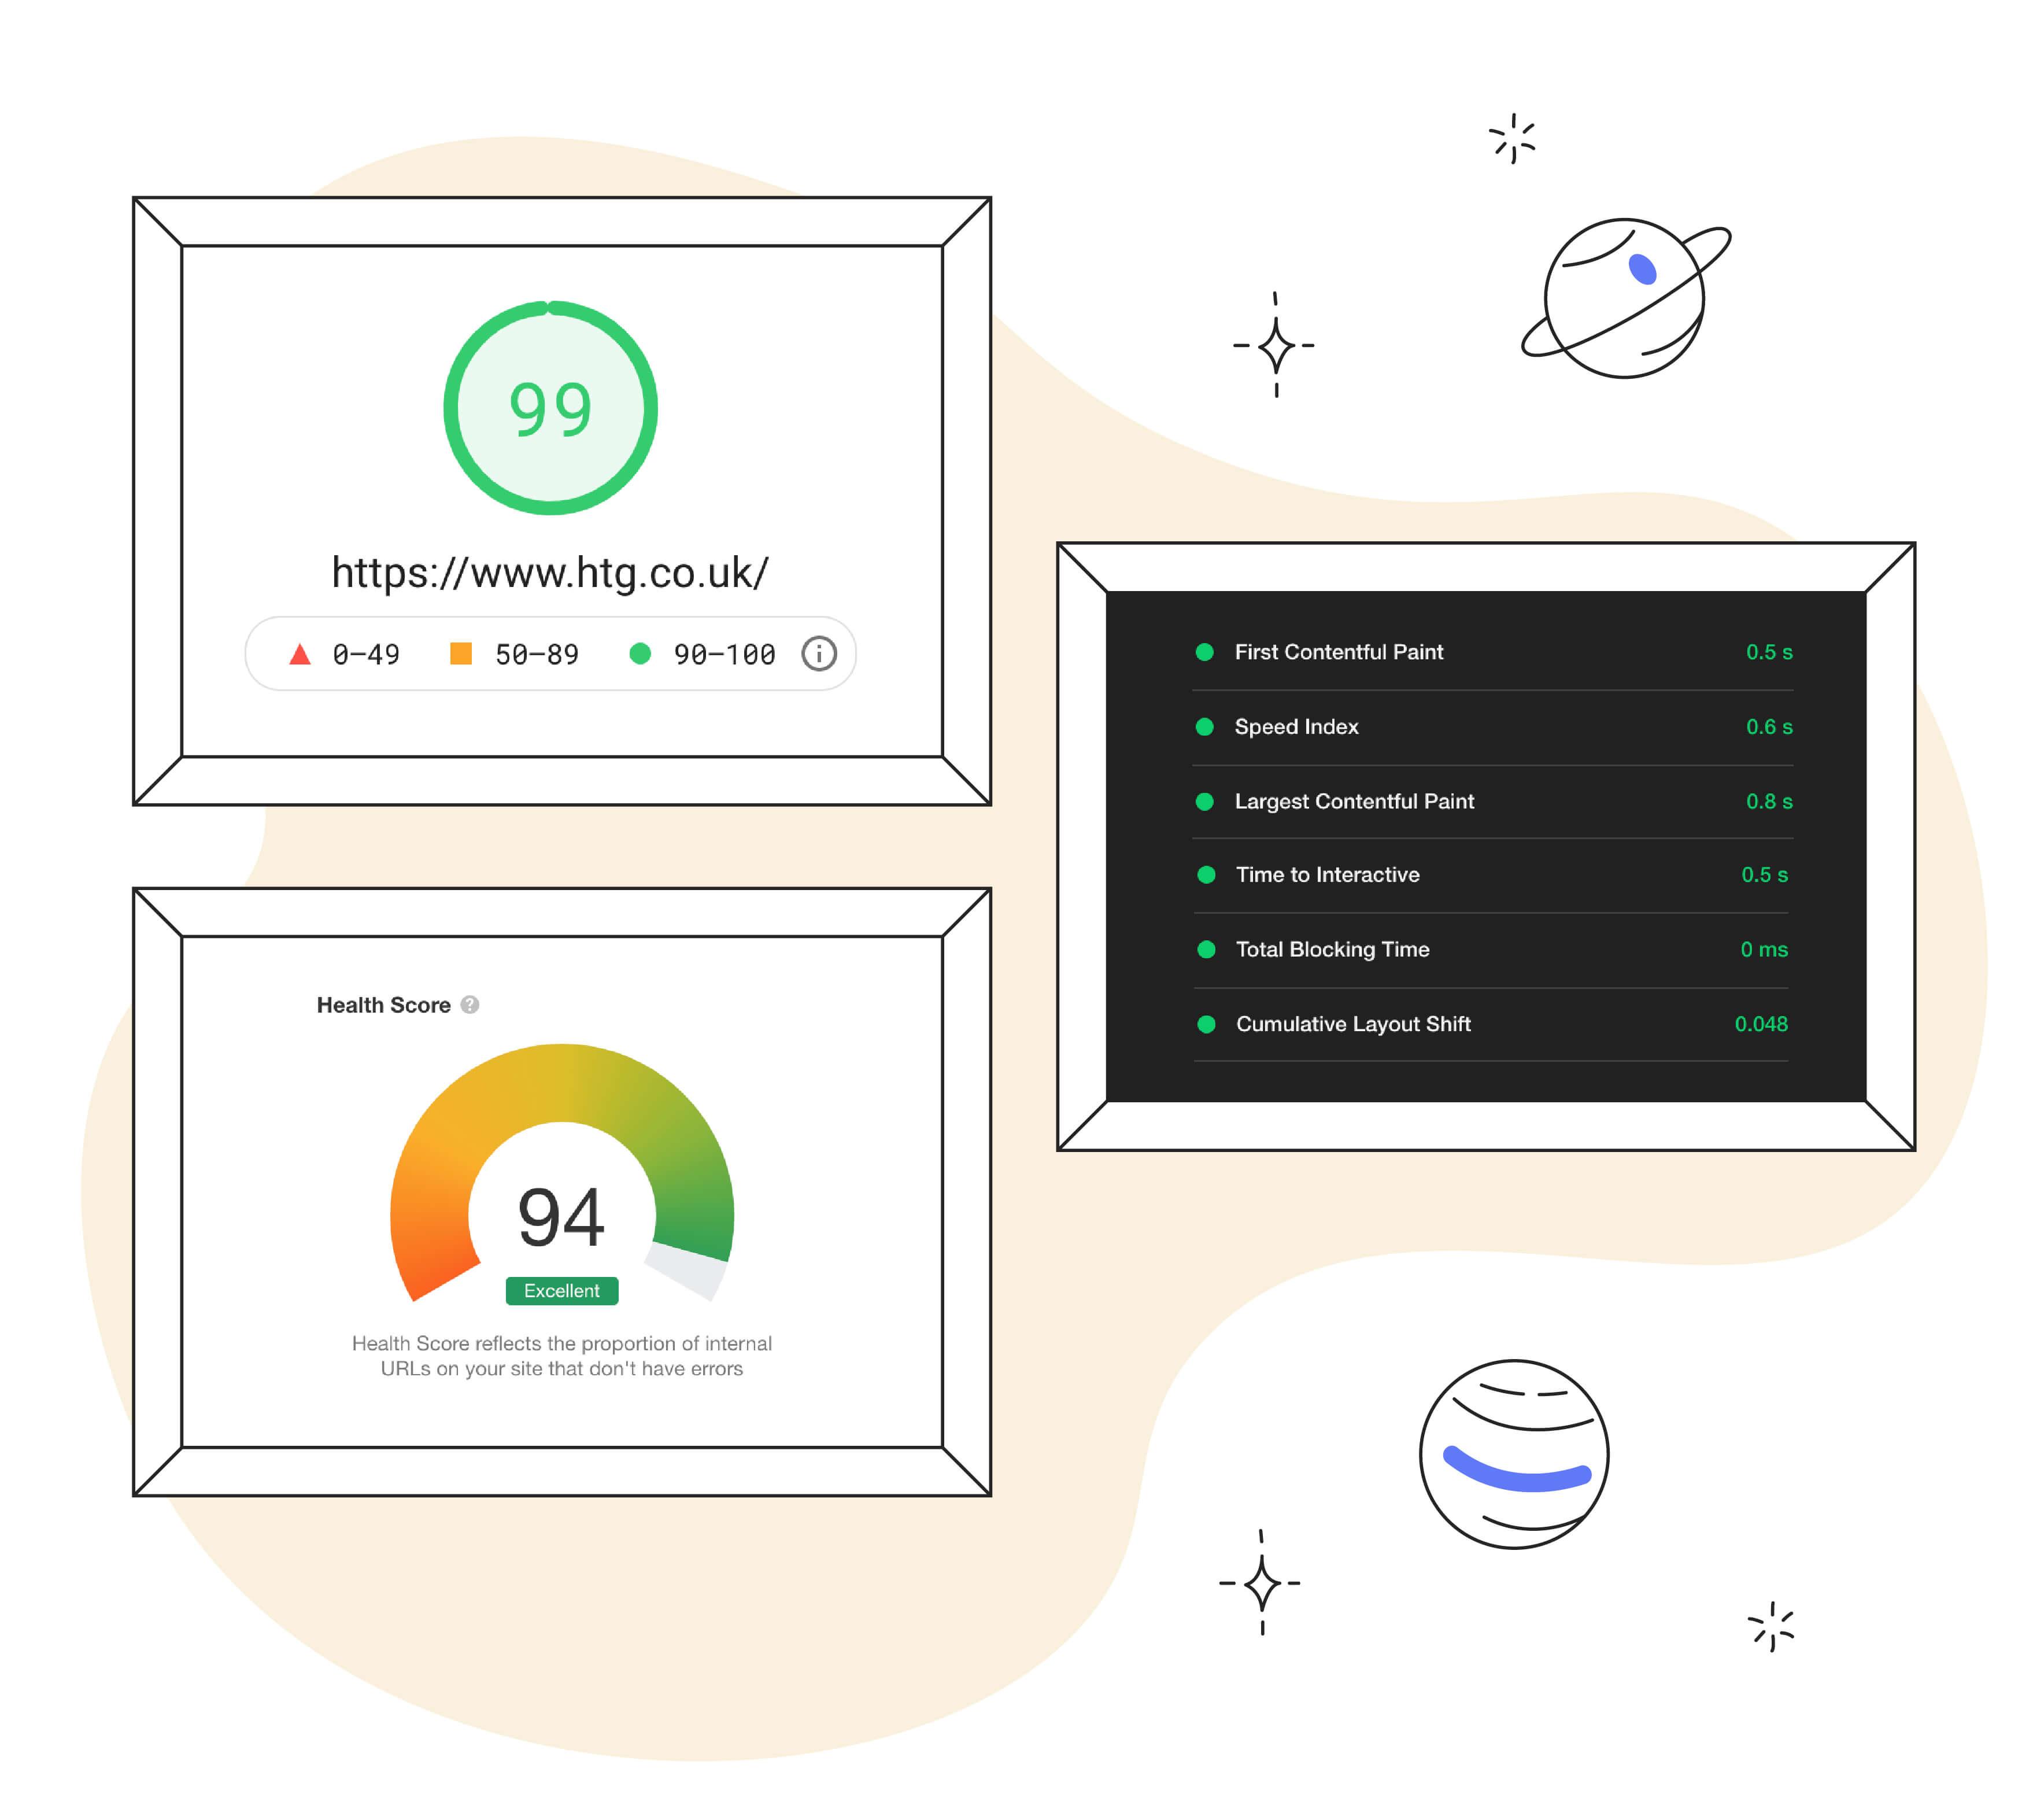 How-Articulate-built-a-winning-HubSpot-website-for-HTG_Stand-out-results-02